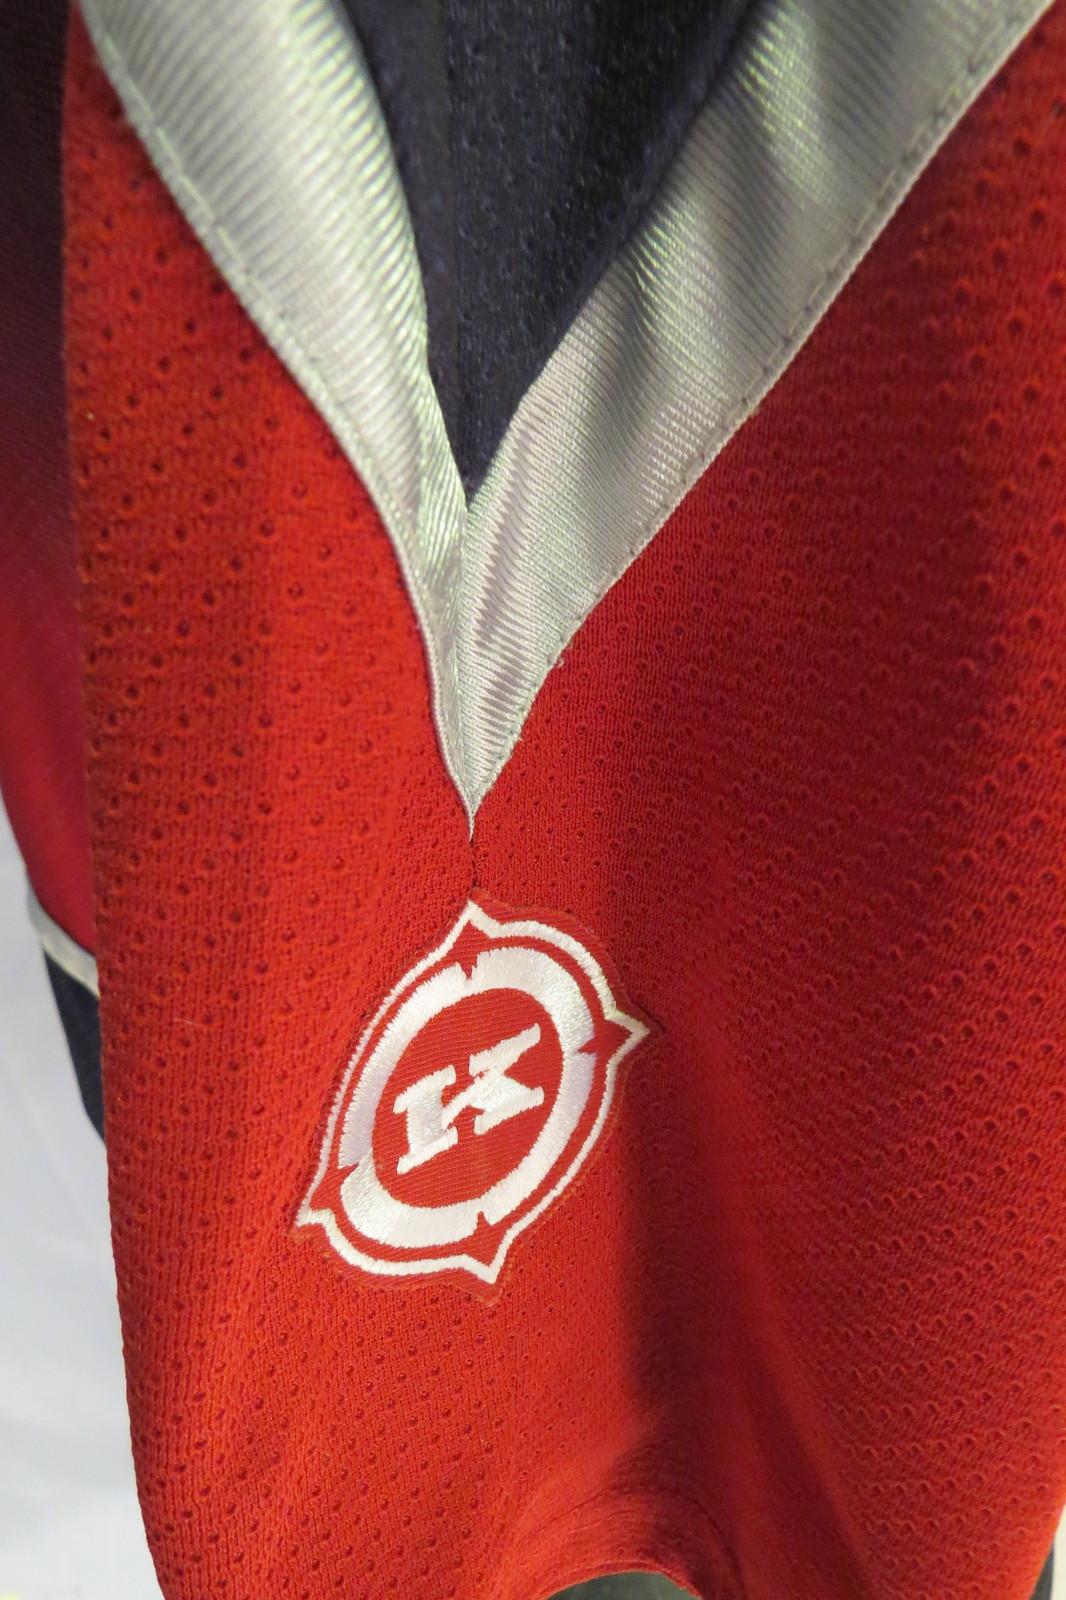 Vancouver Canucks Jersey (Retro) - Alternate 3rd Jersey - By Koho - Men s XL f7c51088e